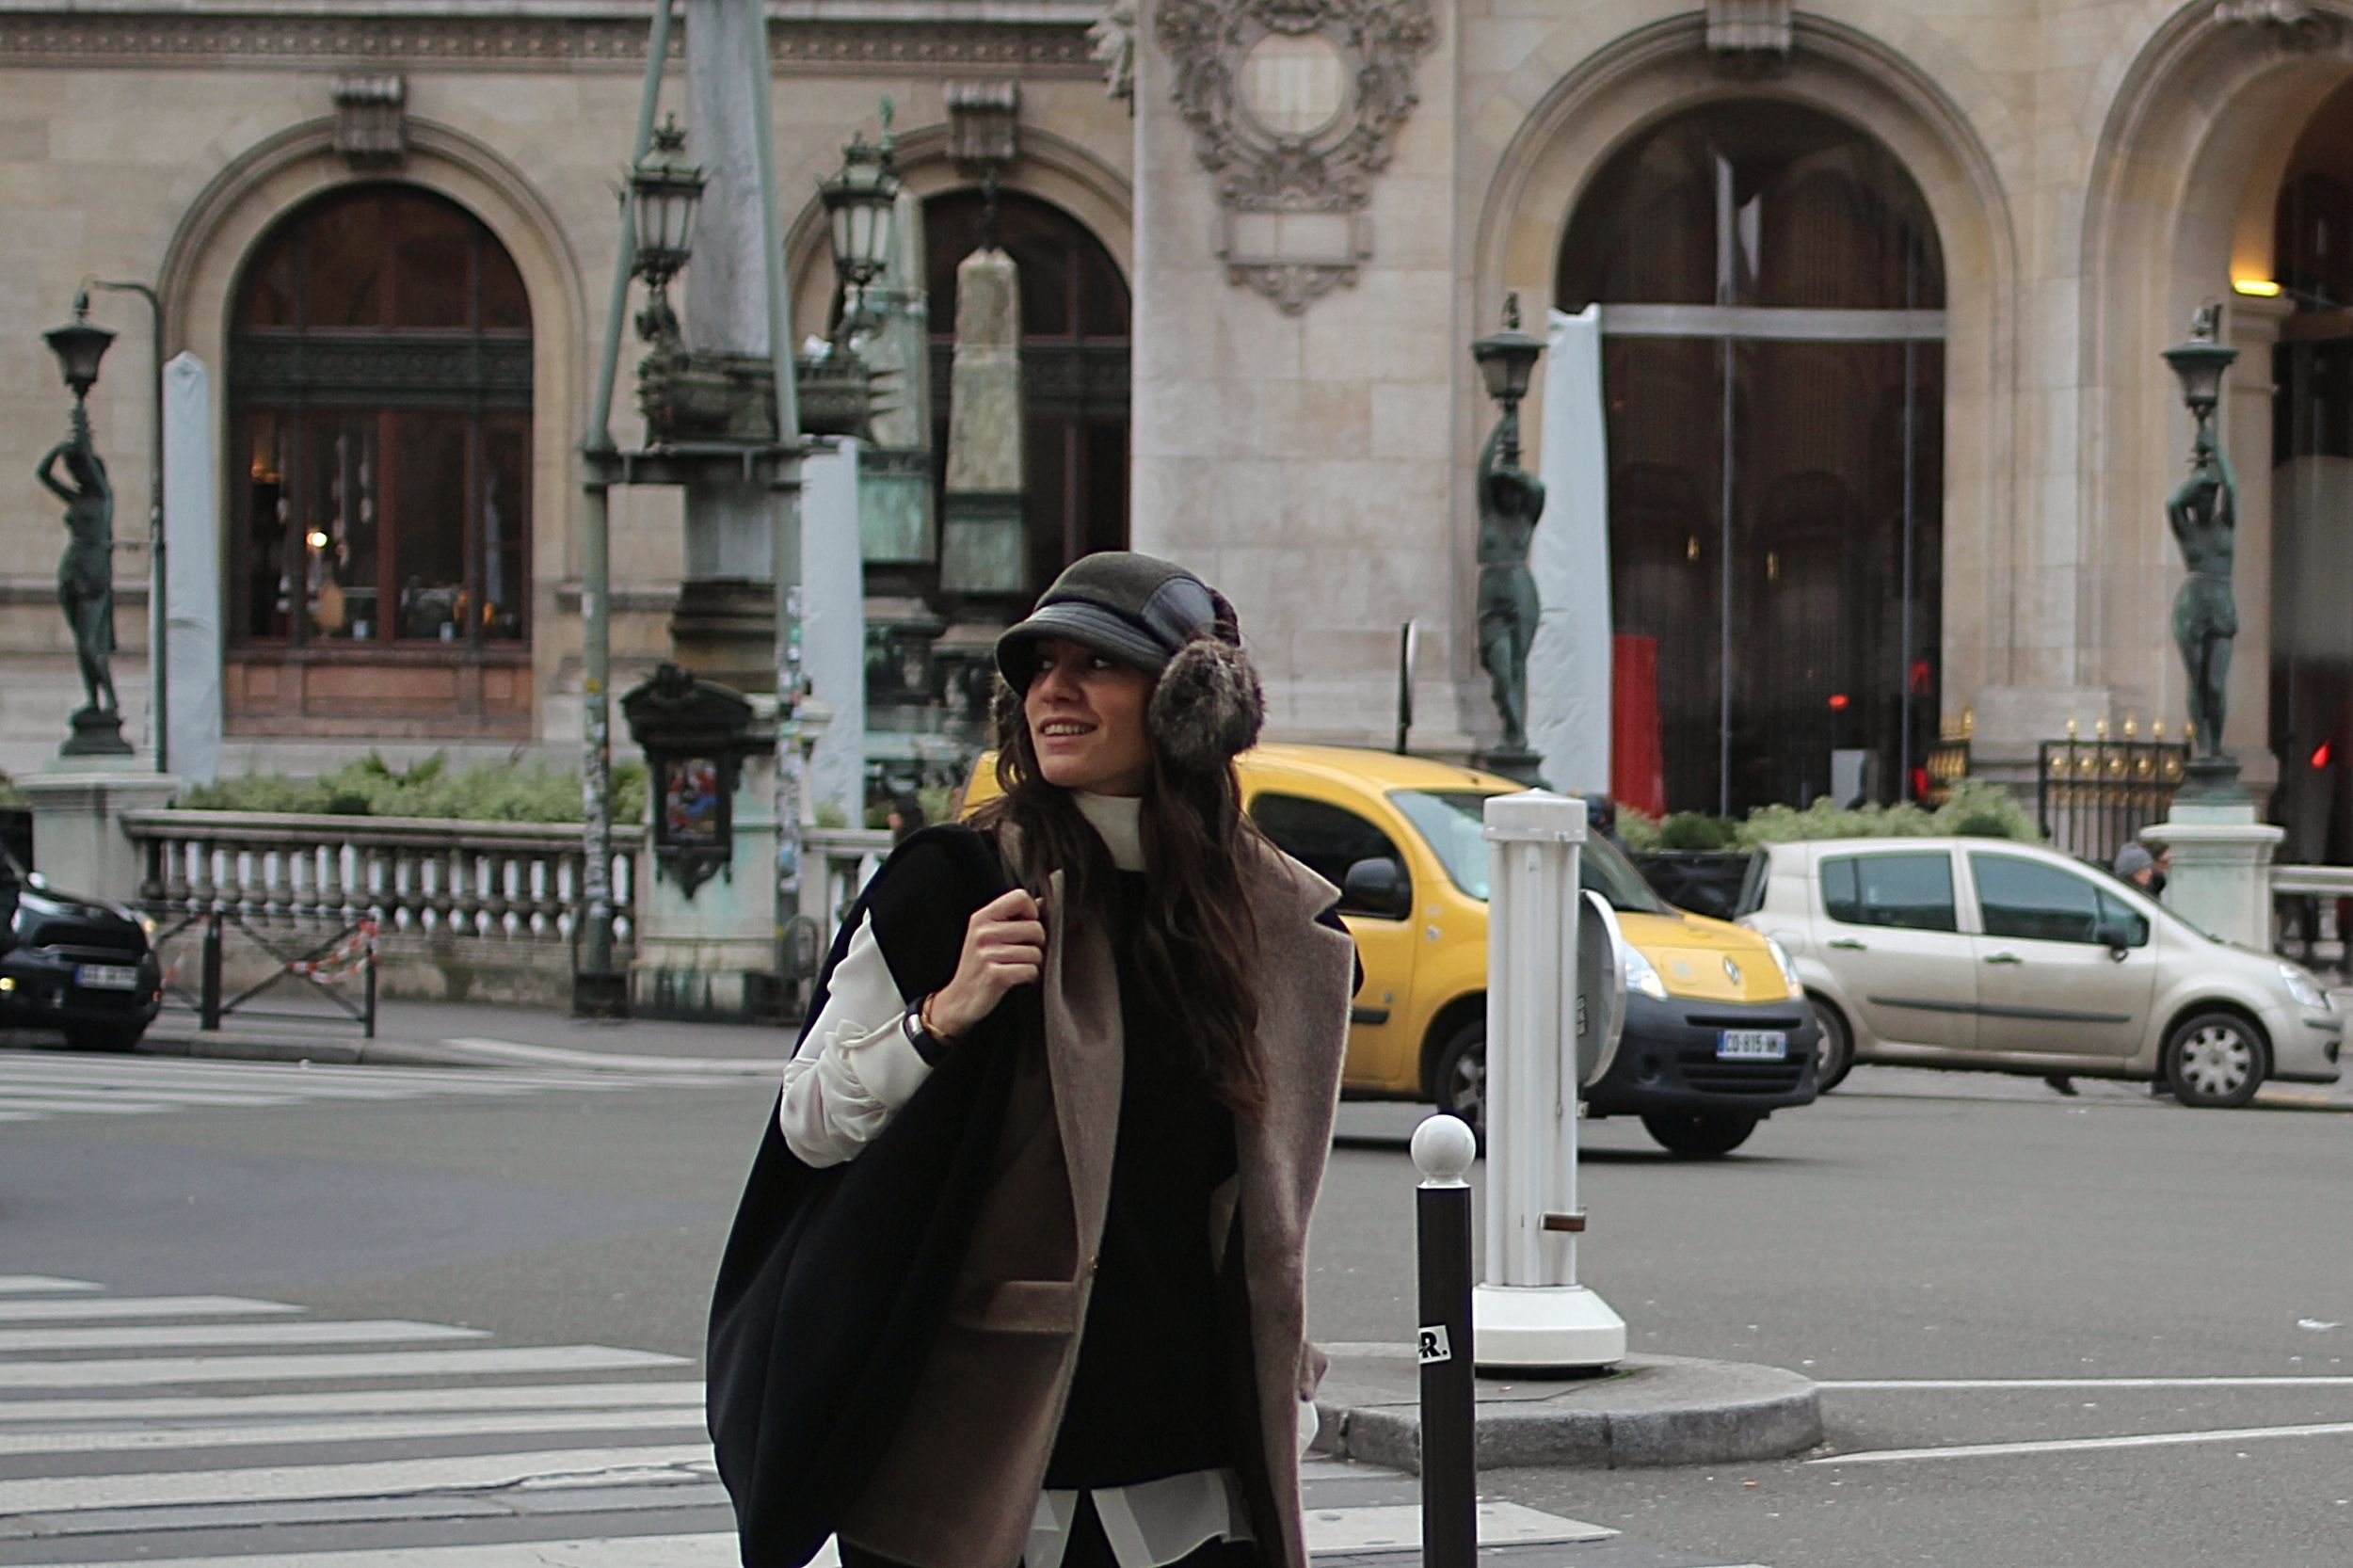 off ne giysem, paris, gamze saraçoğlu, streetstyle, outfit